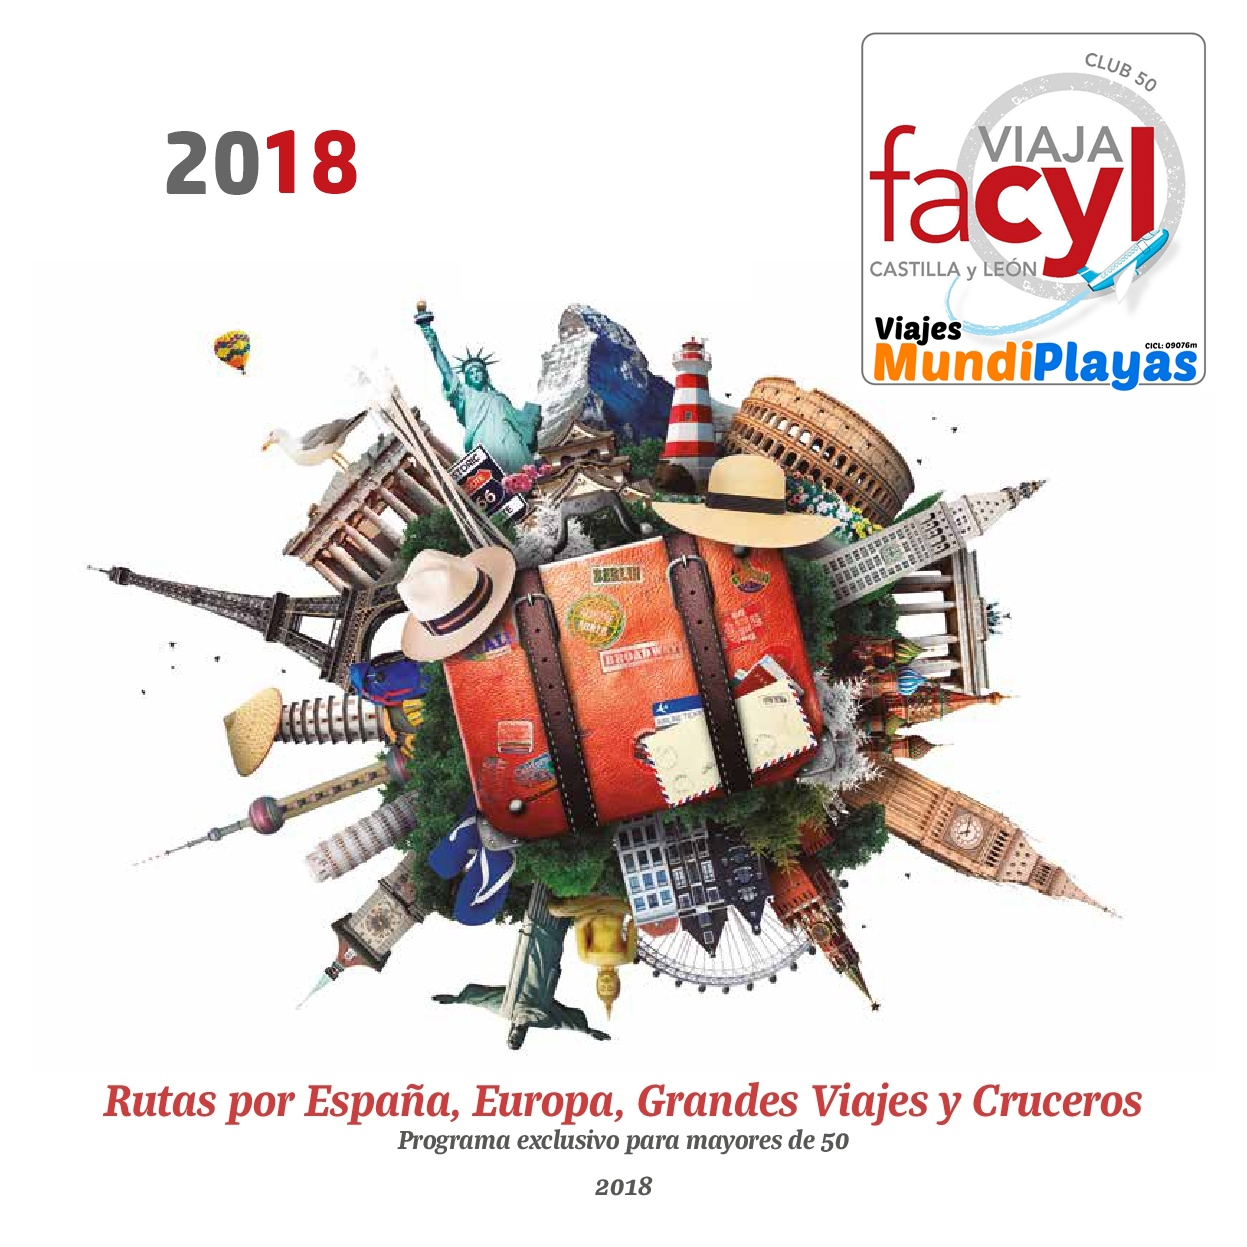 facyl 2018 - viajes mundiplayas